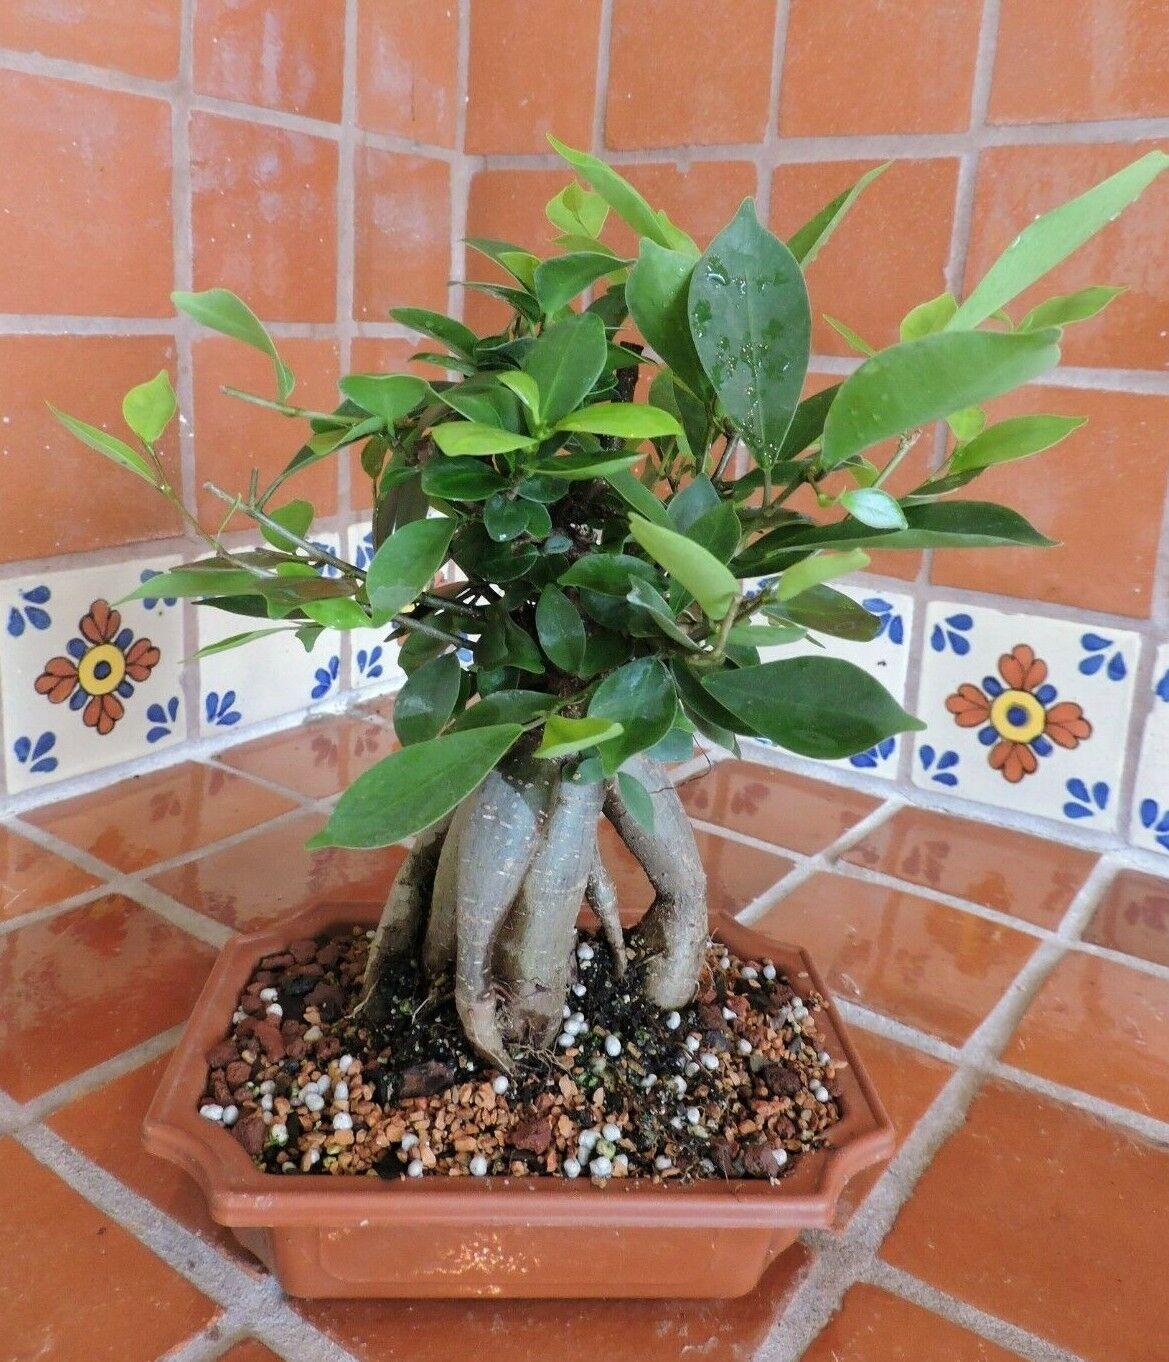 25cm Medium Ficus Ginseng Bonsai Tree Ginseng Ficus Tree For Sale Online